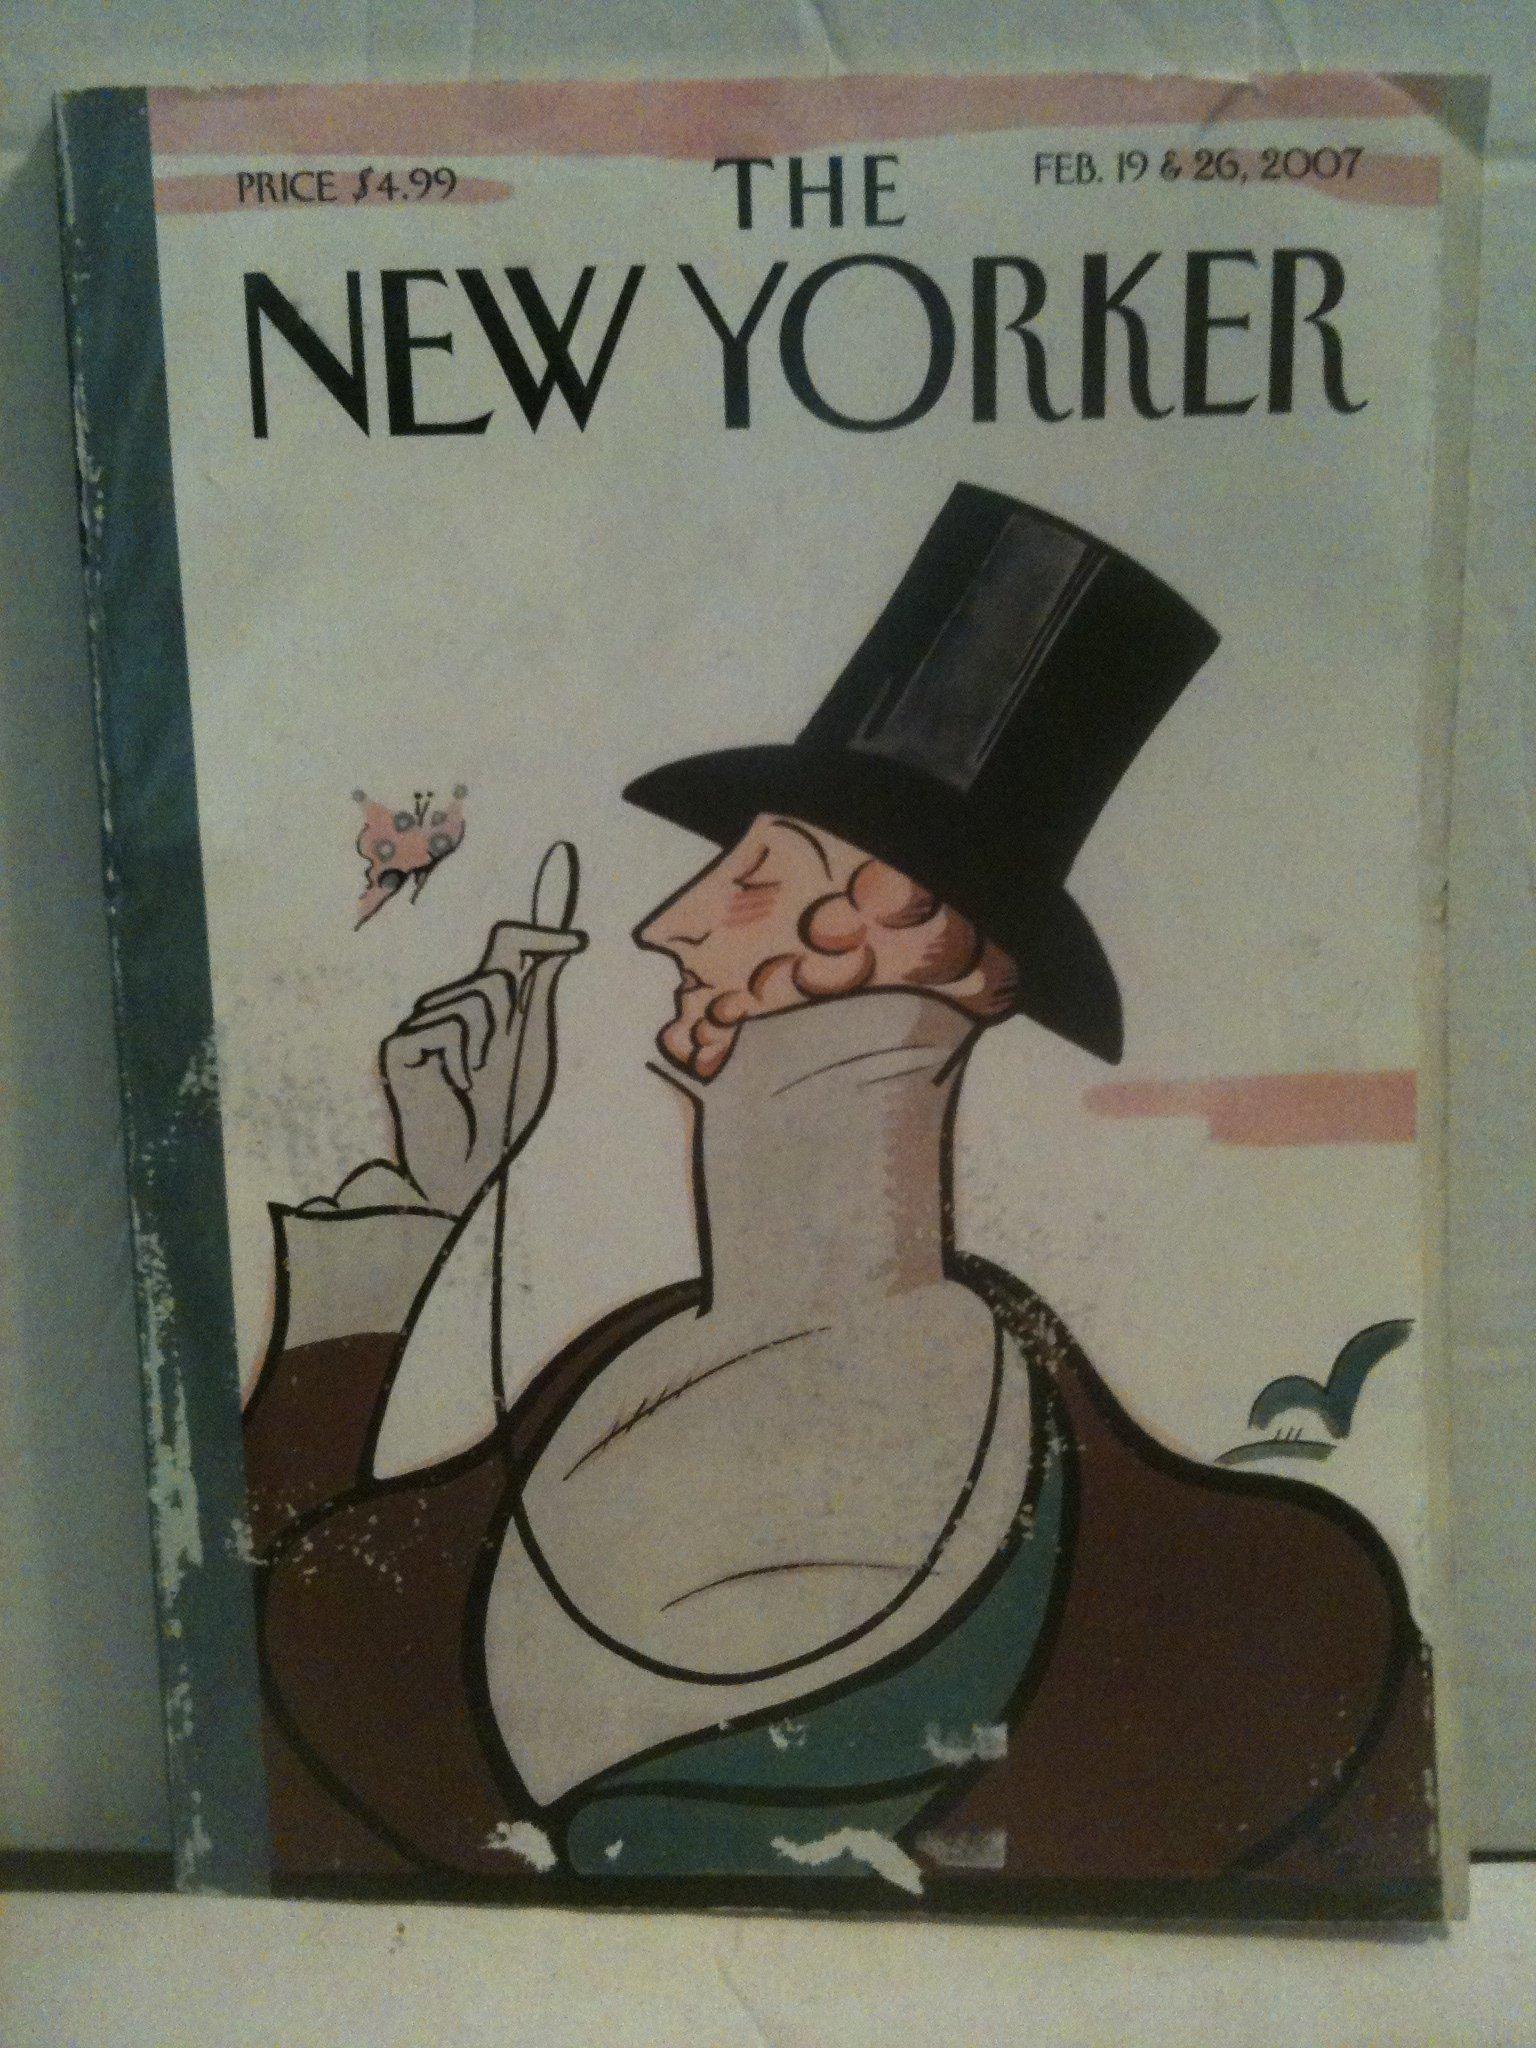 Download The New Yorker Magazine, Feb. 19 & 26, 2007 ebook